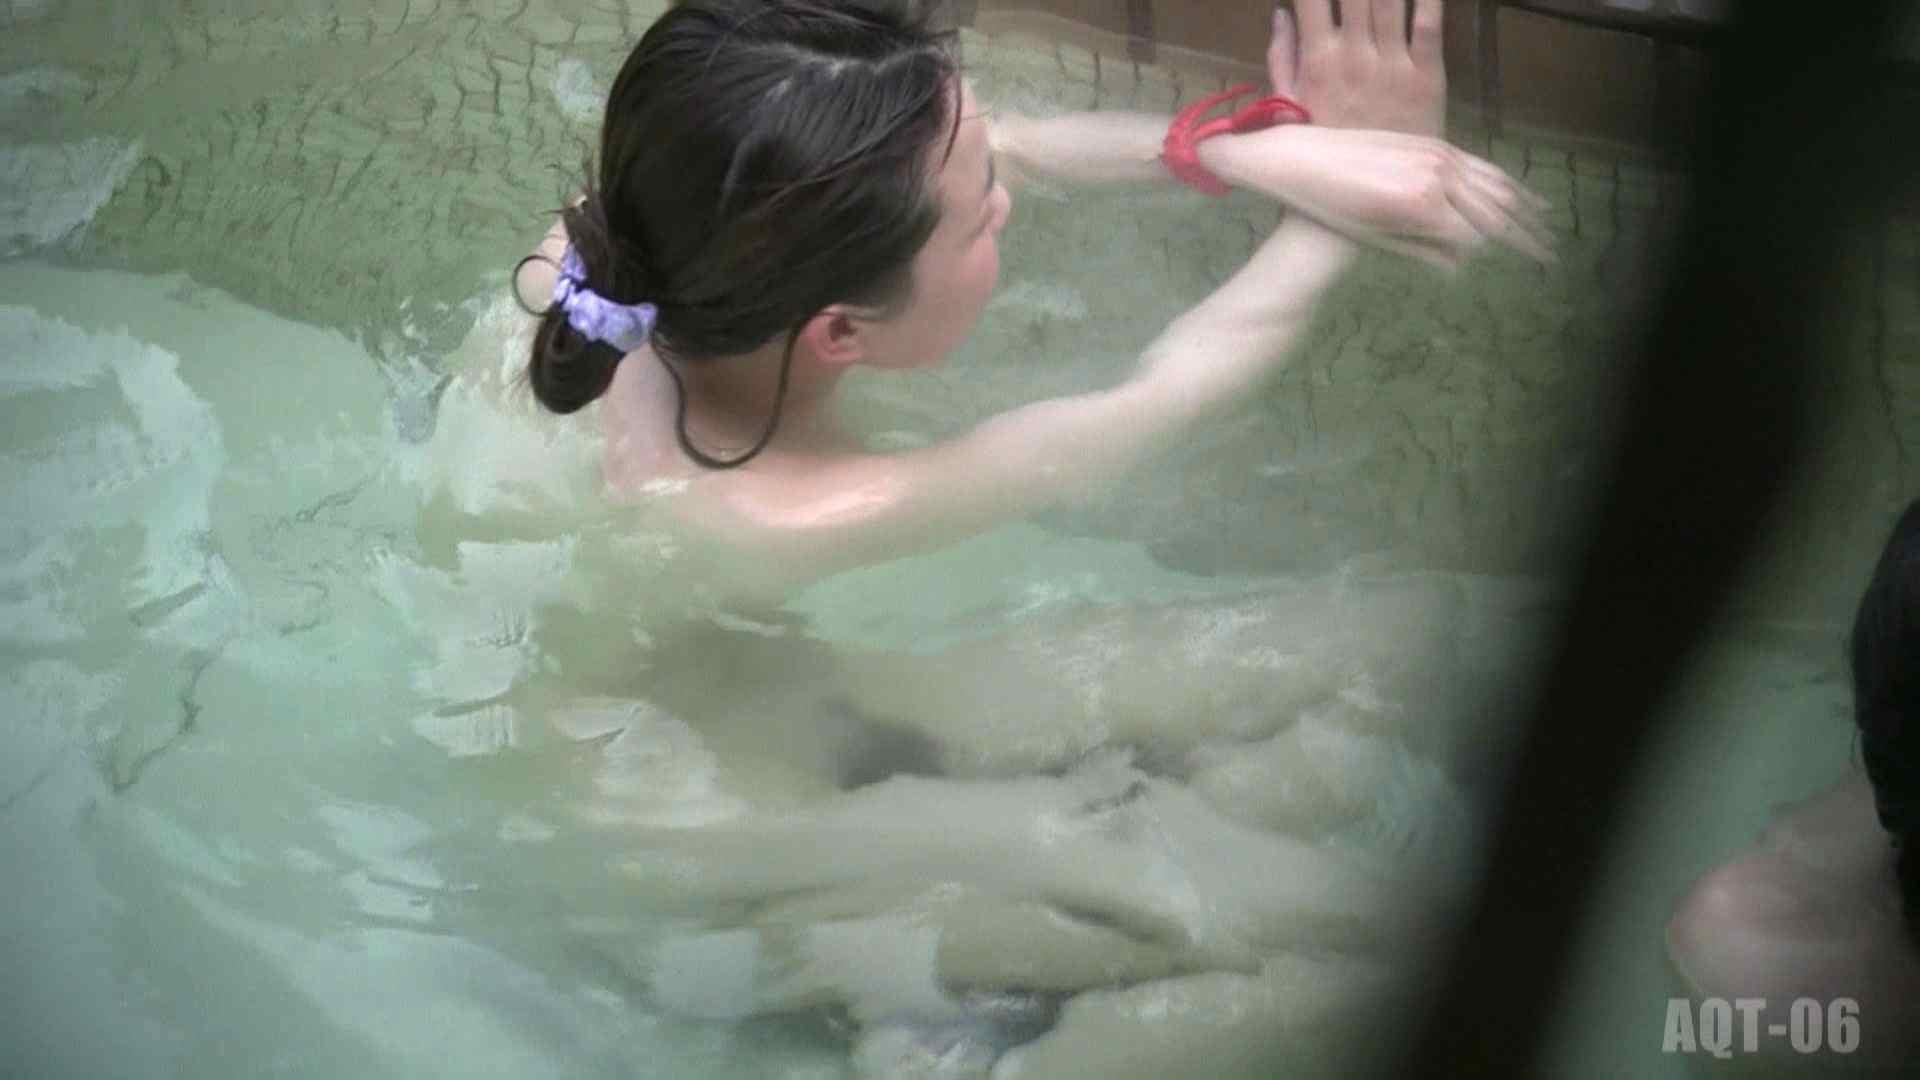 Aquaな露天風呂Vol.758 OL女体 すけべAV動画紹介 90連発 44